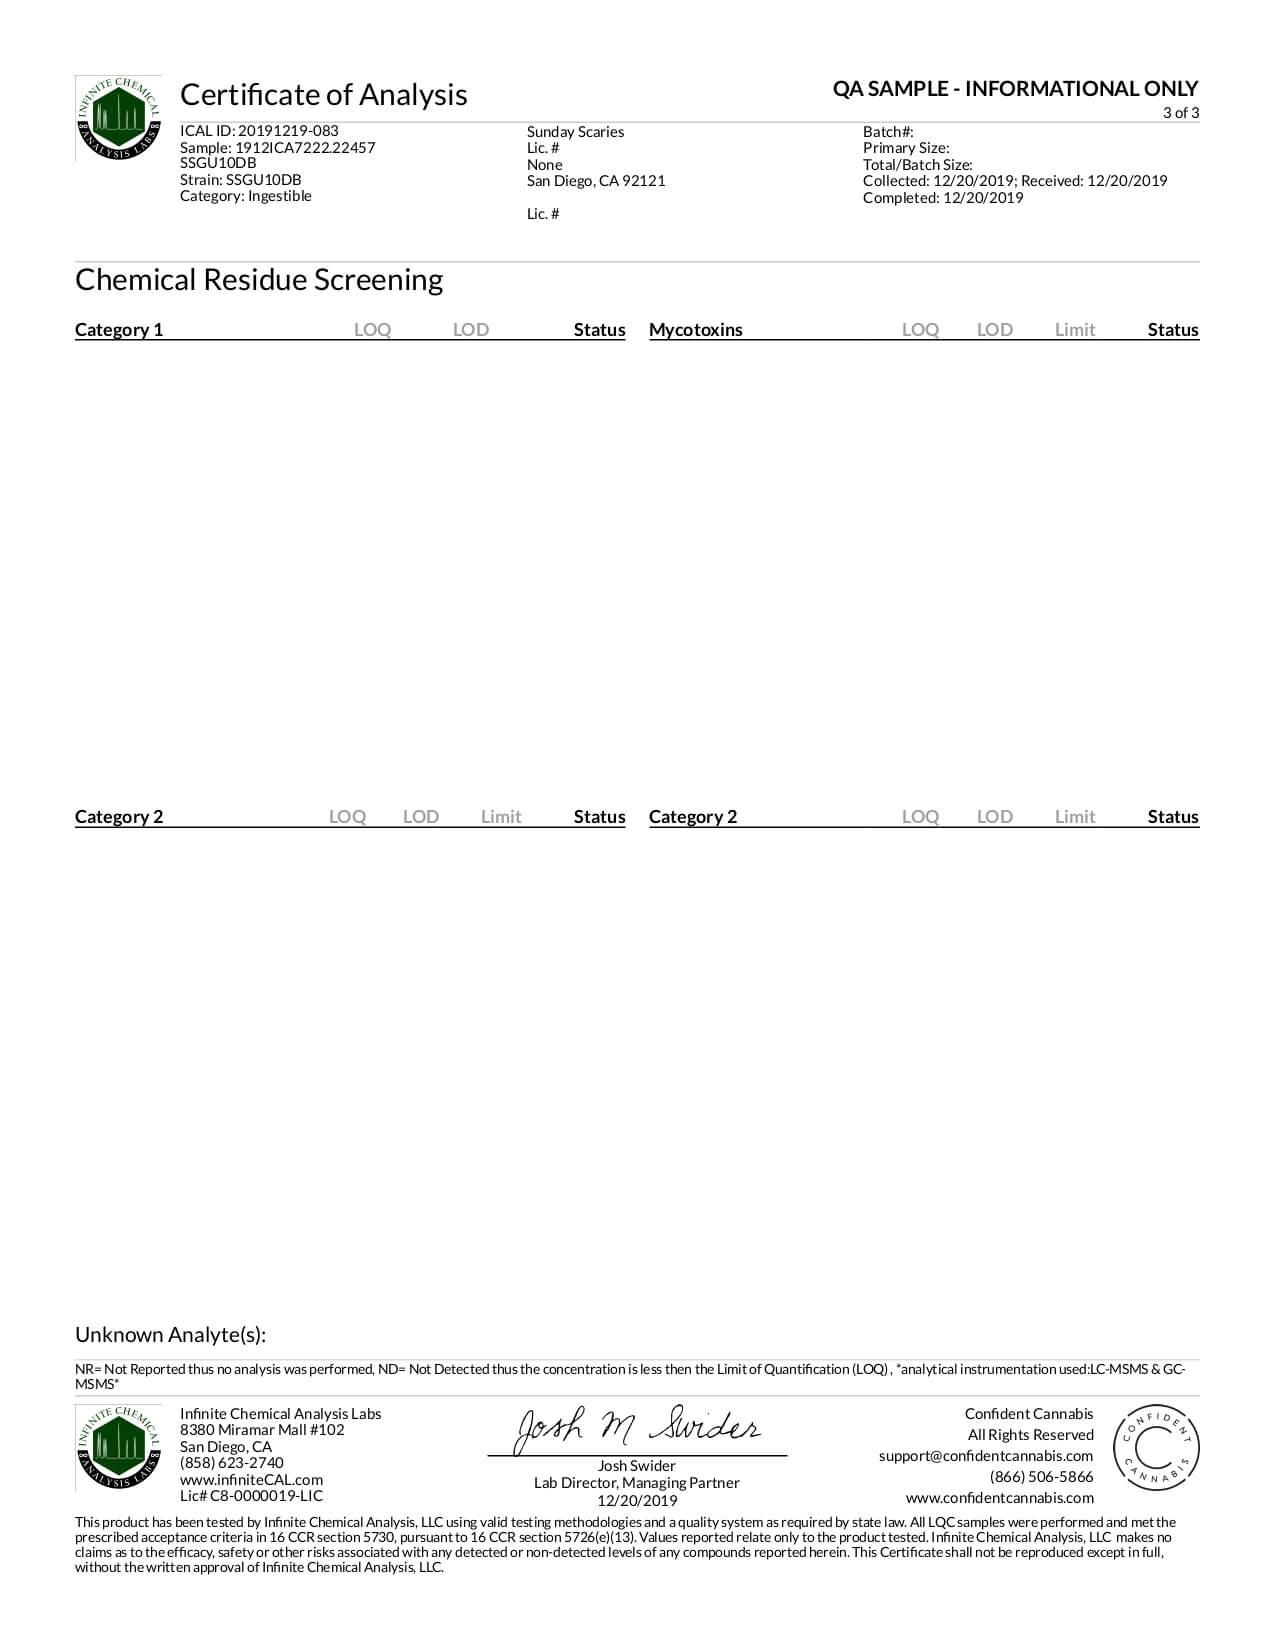 Sunday Scaries CBD Edible Broad Spectrum Gummies w/Vitamins B12 & D3 Lab Report